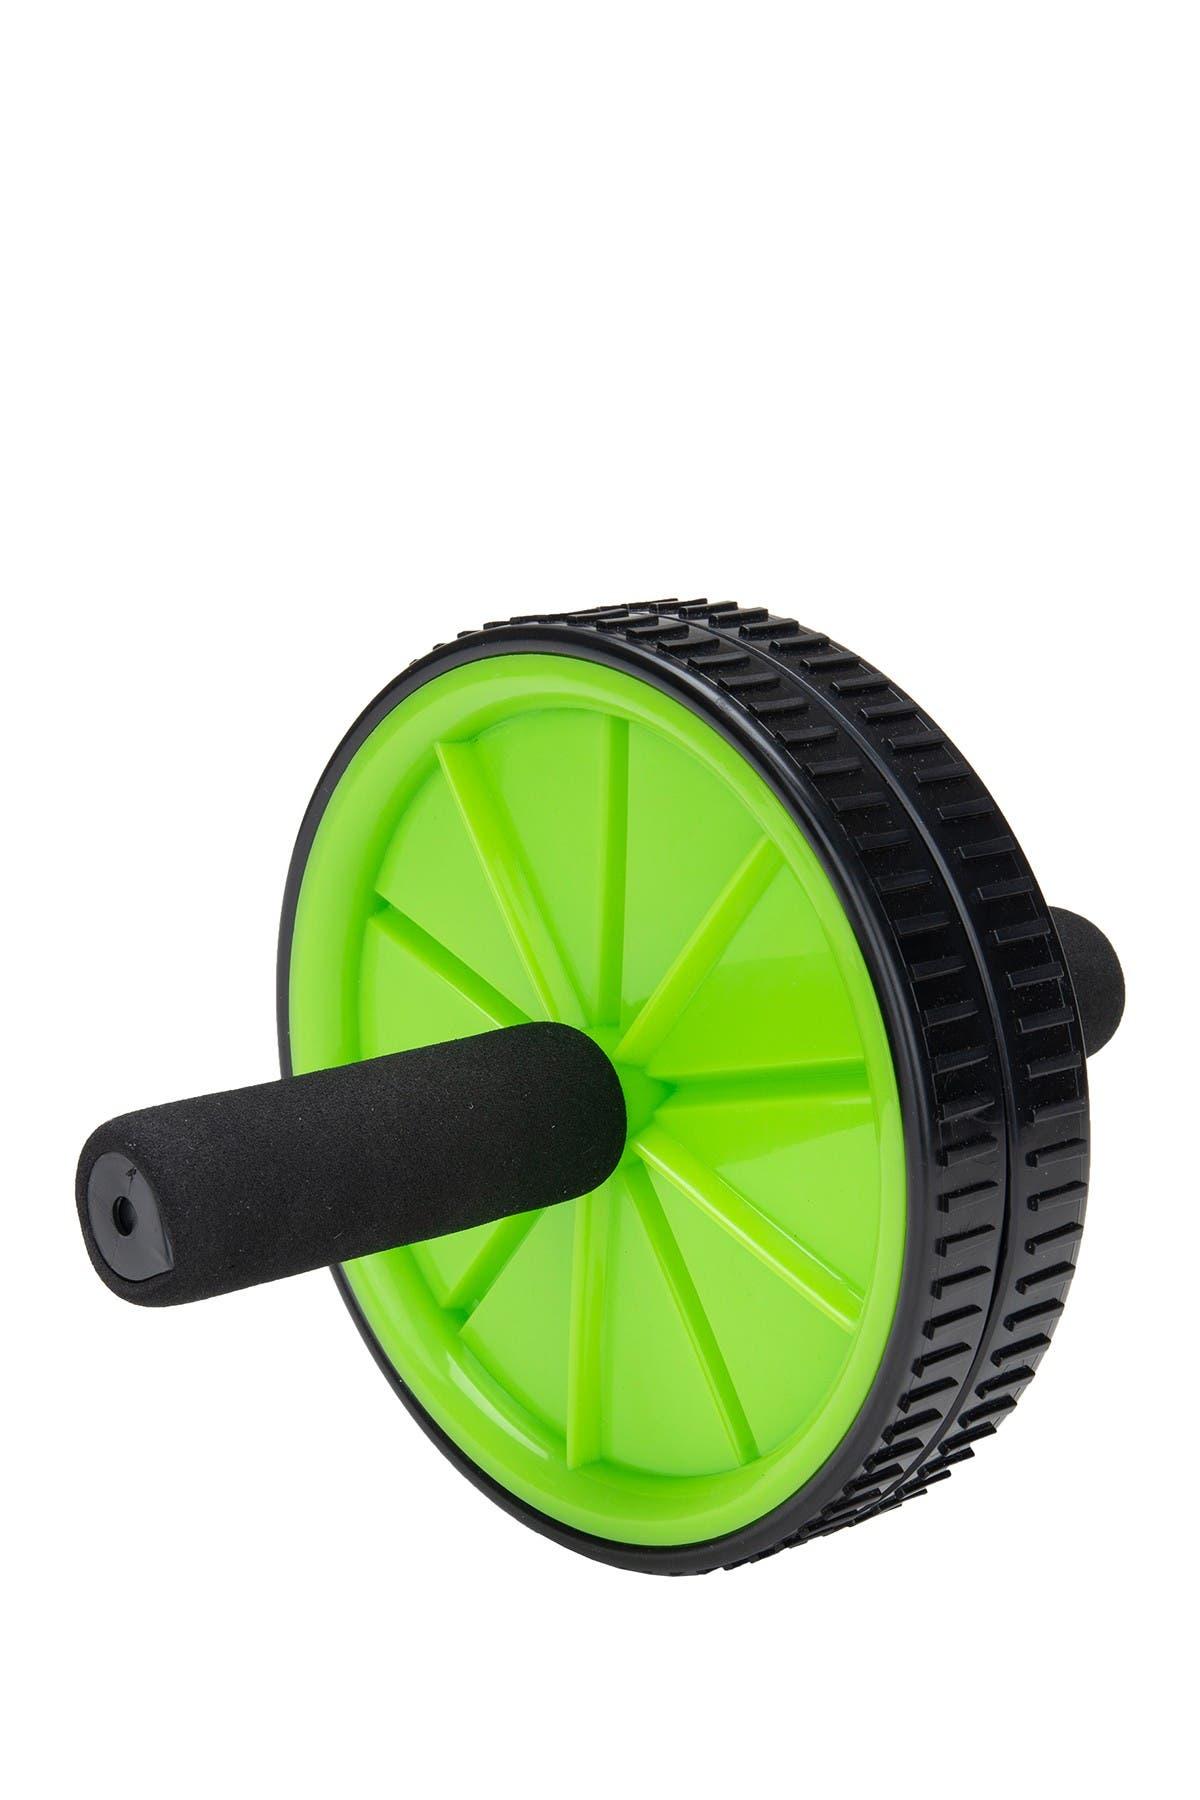 Image of Mindreader Dual Wheel Split Ab Roller